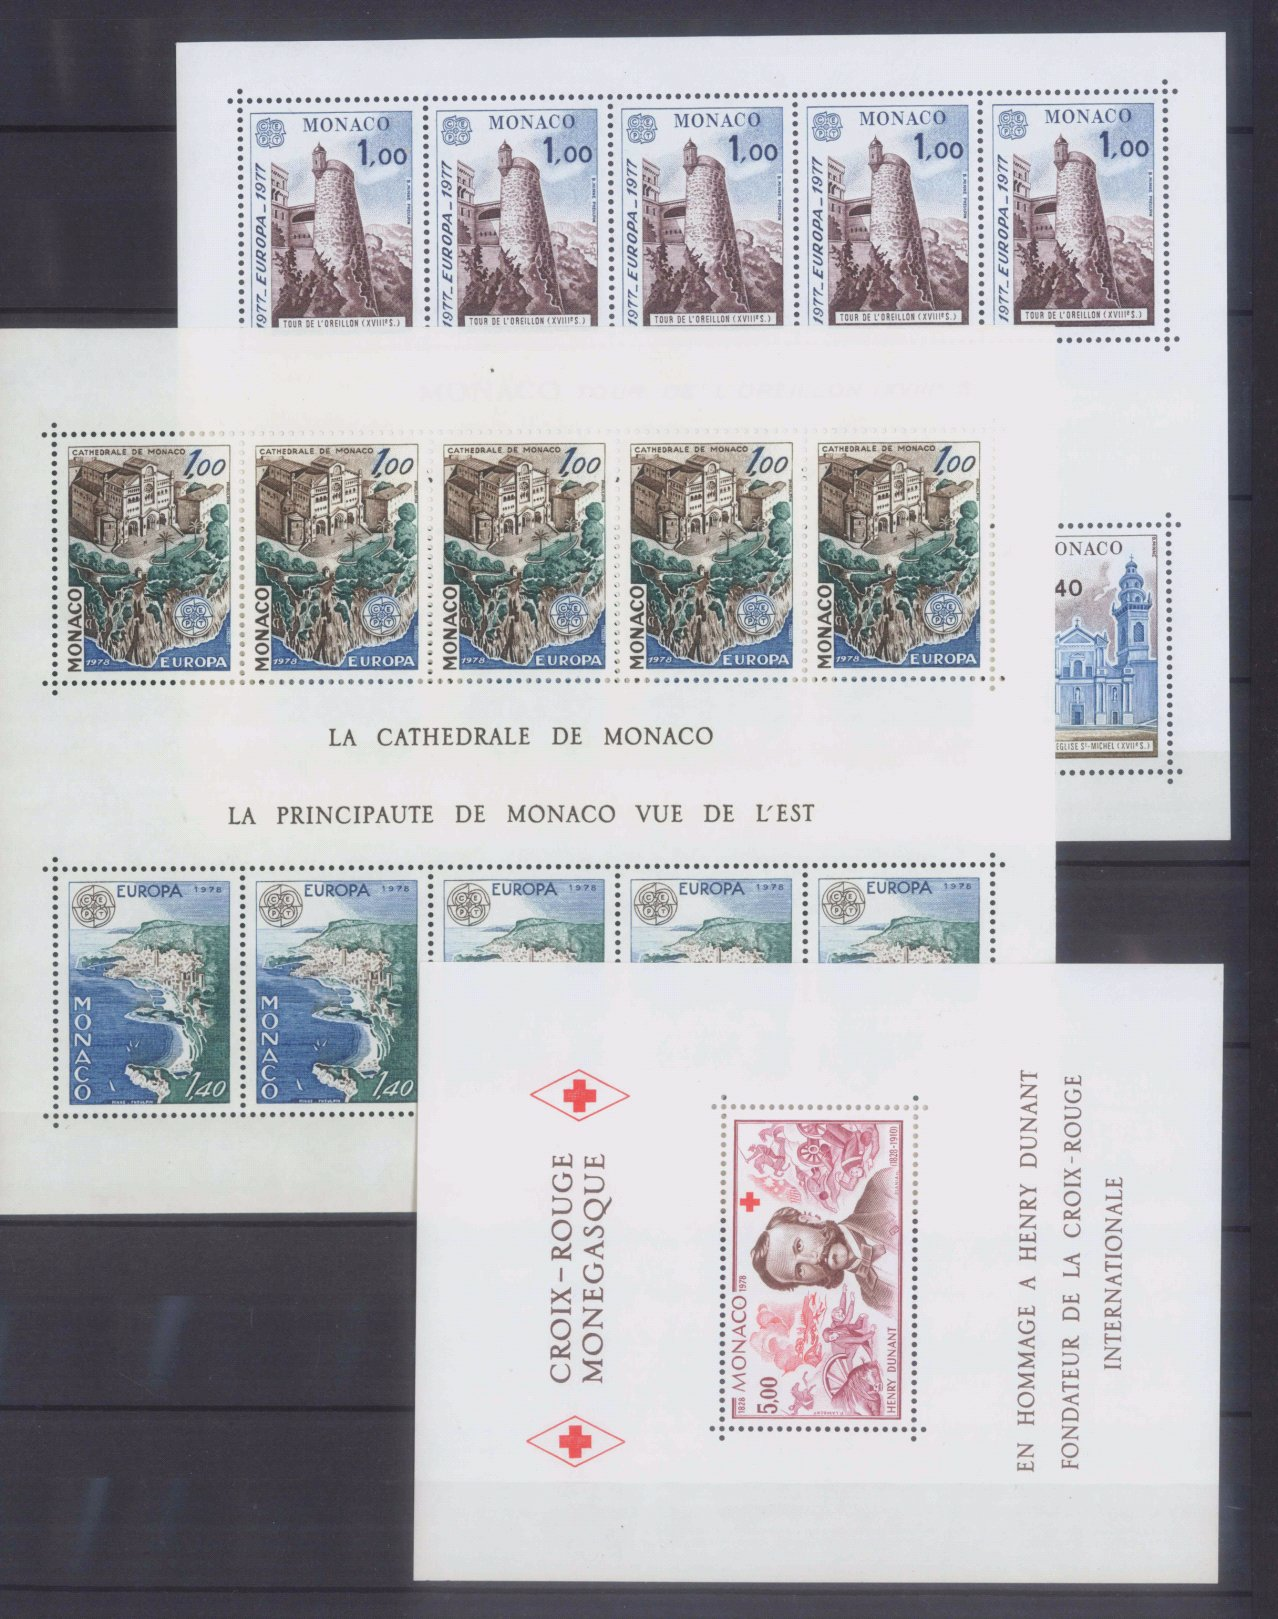 MONACO 1953-1989, Katalogwert 970,- Euro-2